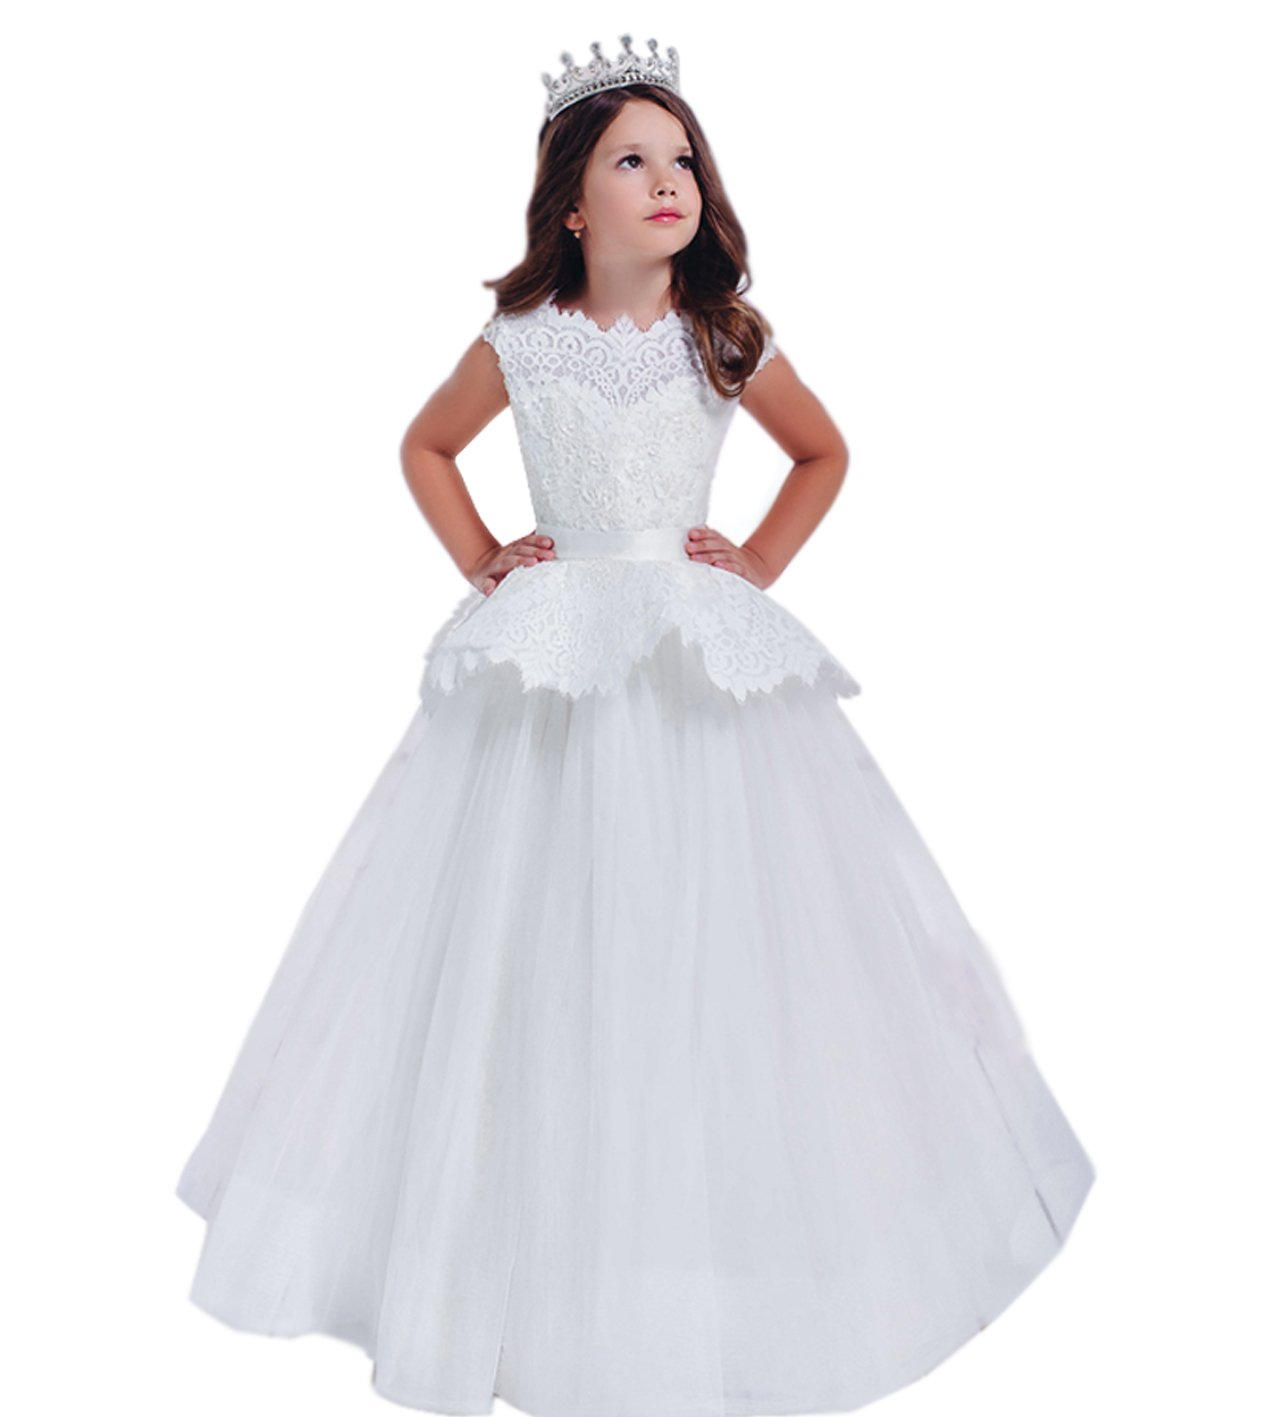 Kelaixiang Formal Princess Ball Gown Dress For Flower Girl (11) by Kelaixiang